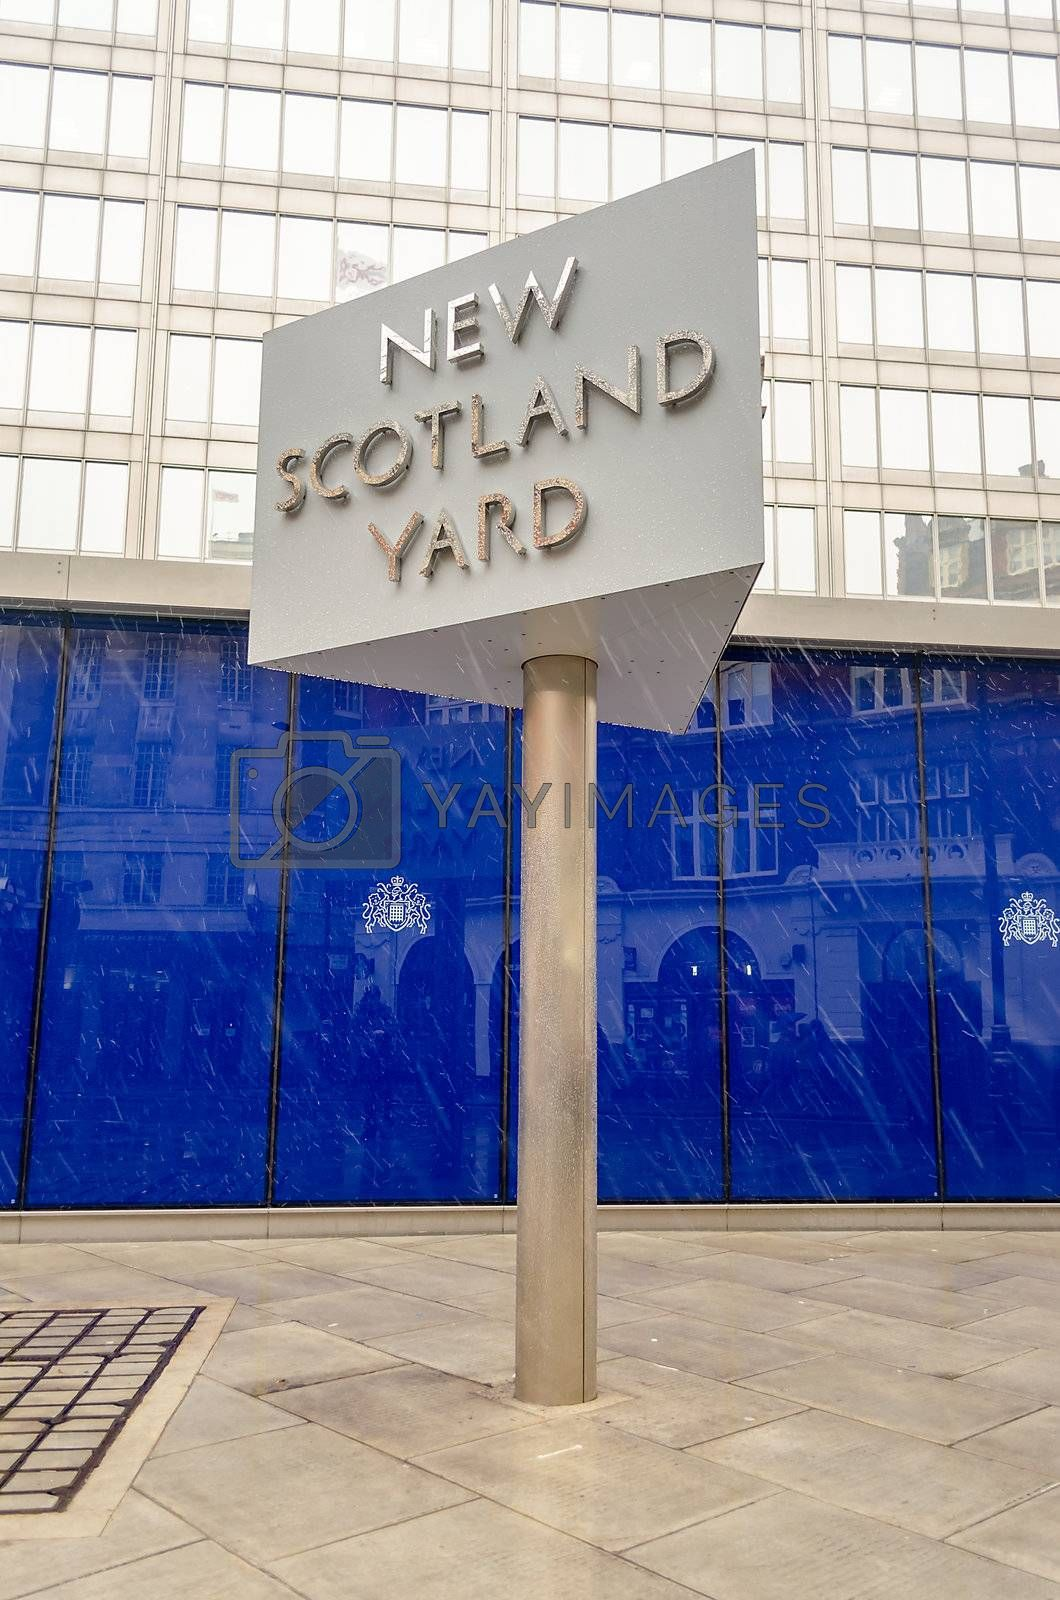 New Scotland Yard Building, London, UK